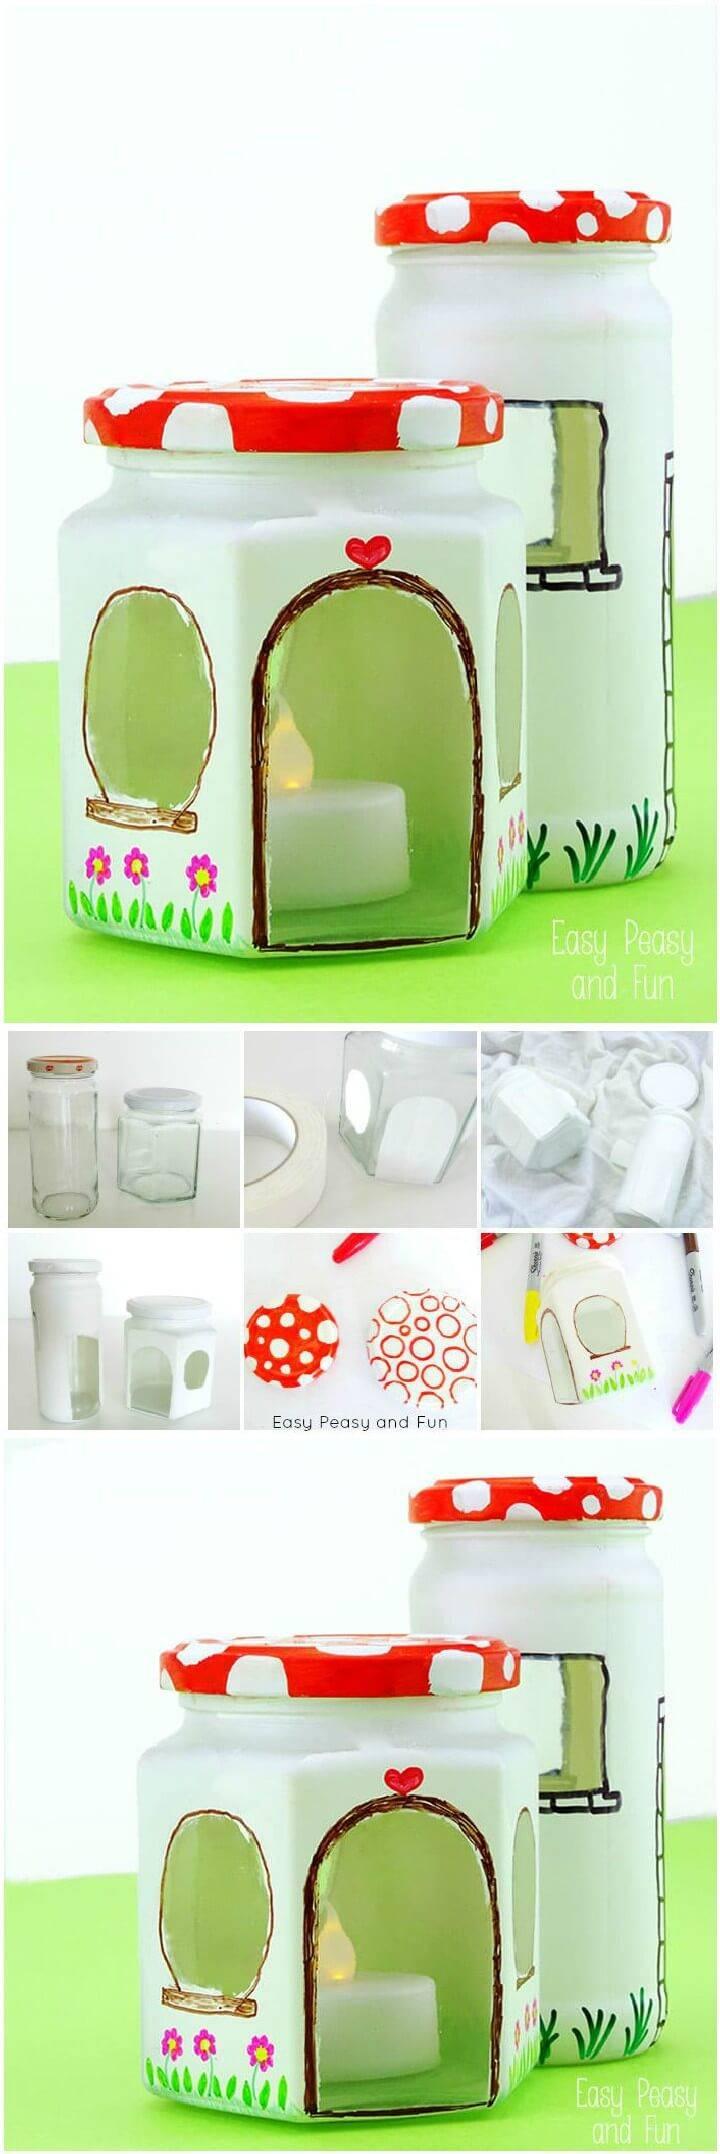 DIY Handcrafted Mason Jar Fairy House Gift